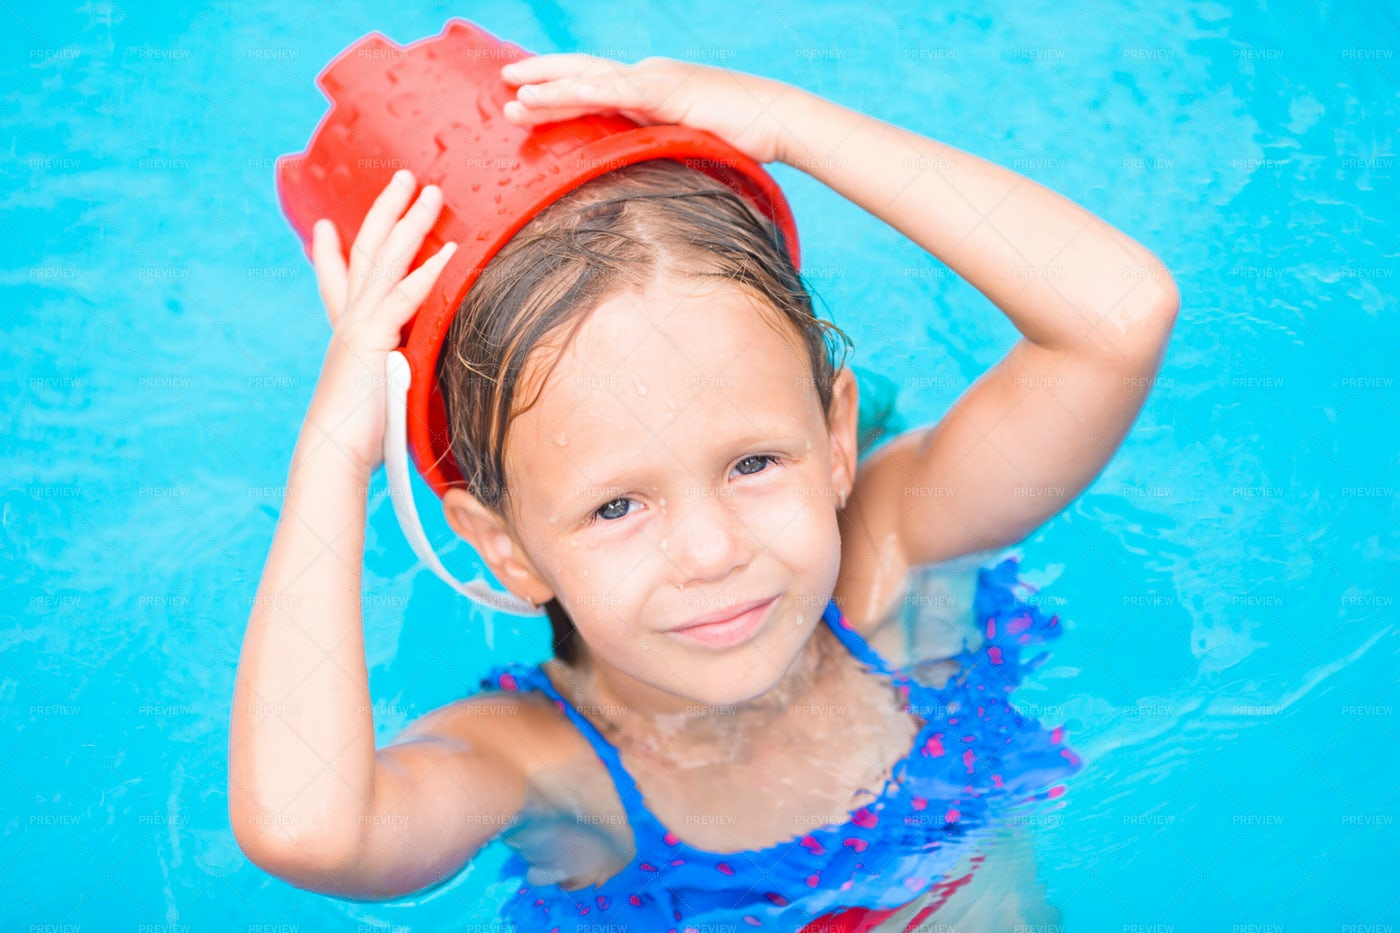 Bucket On Her Head: Stock Photos